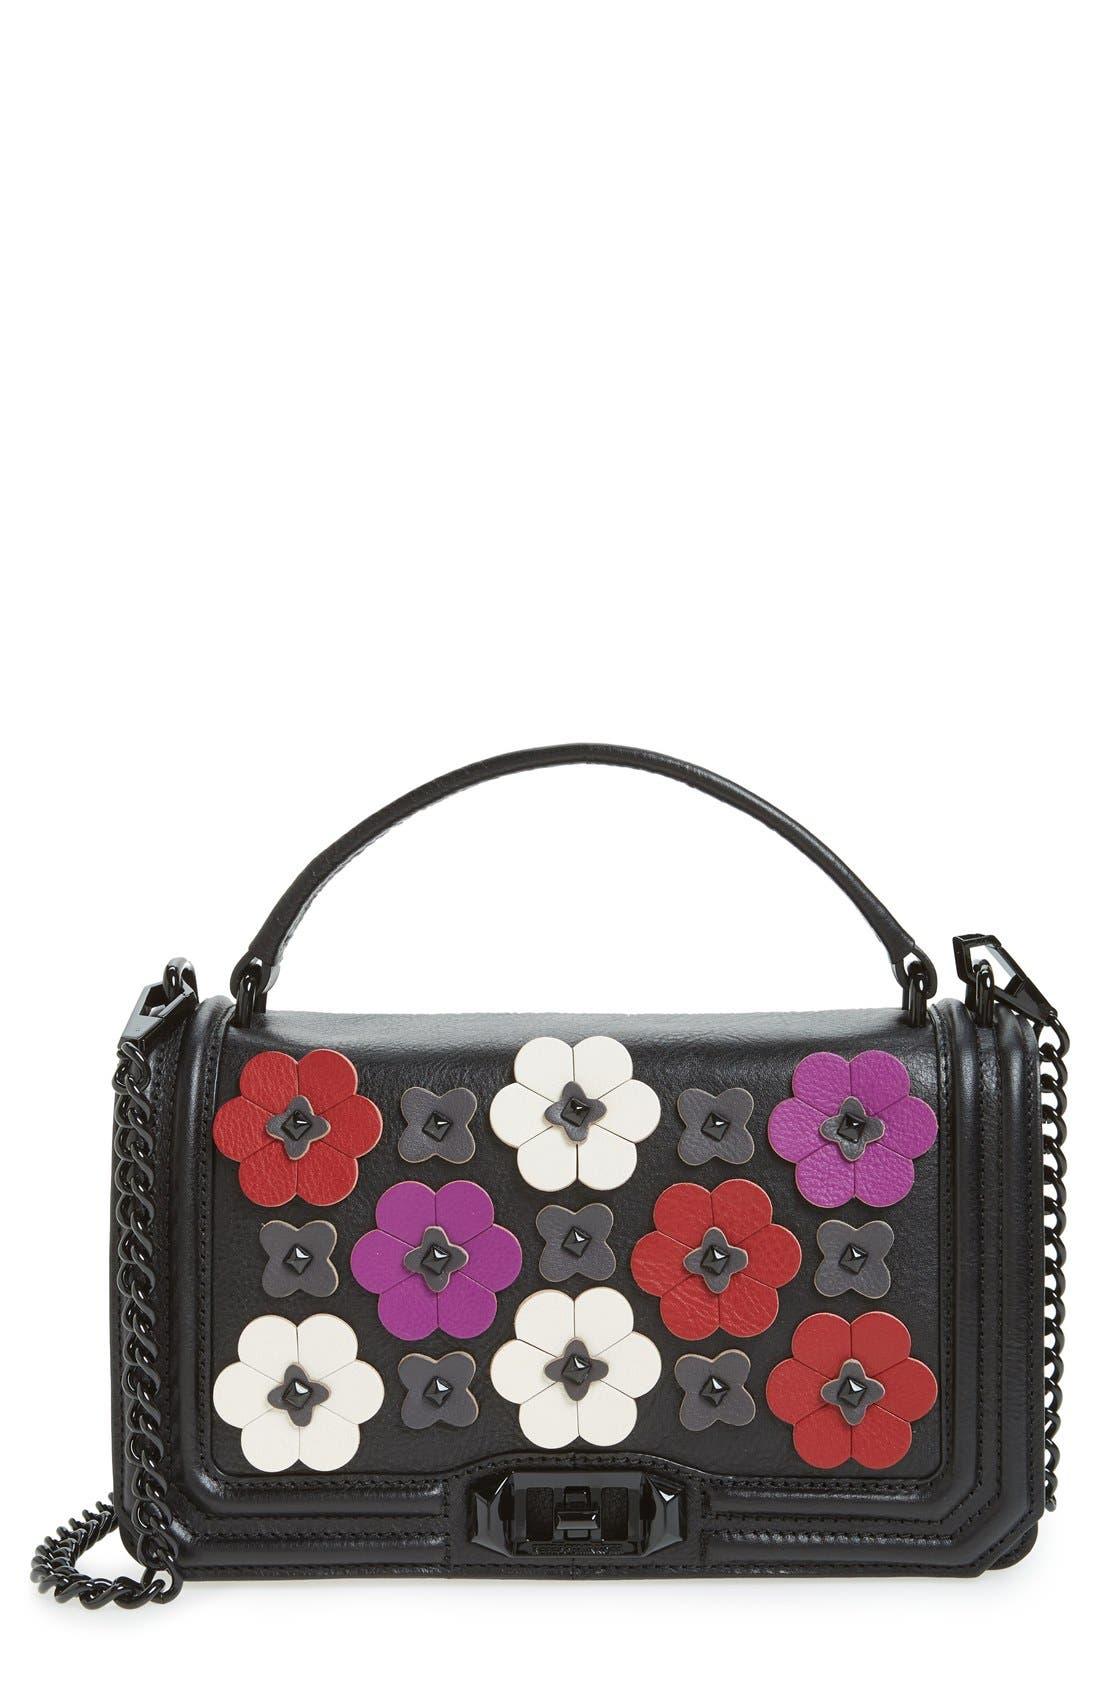 Main Image - Rebecca Minkoff Love Floral Appliqué Crossbody Bag